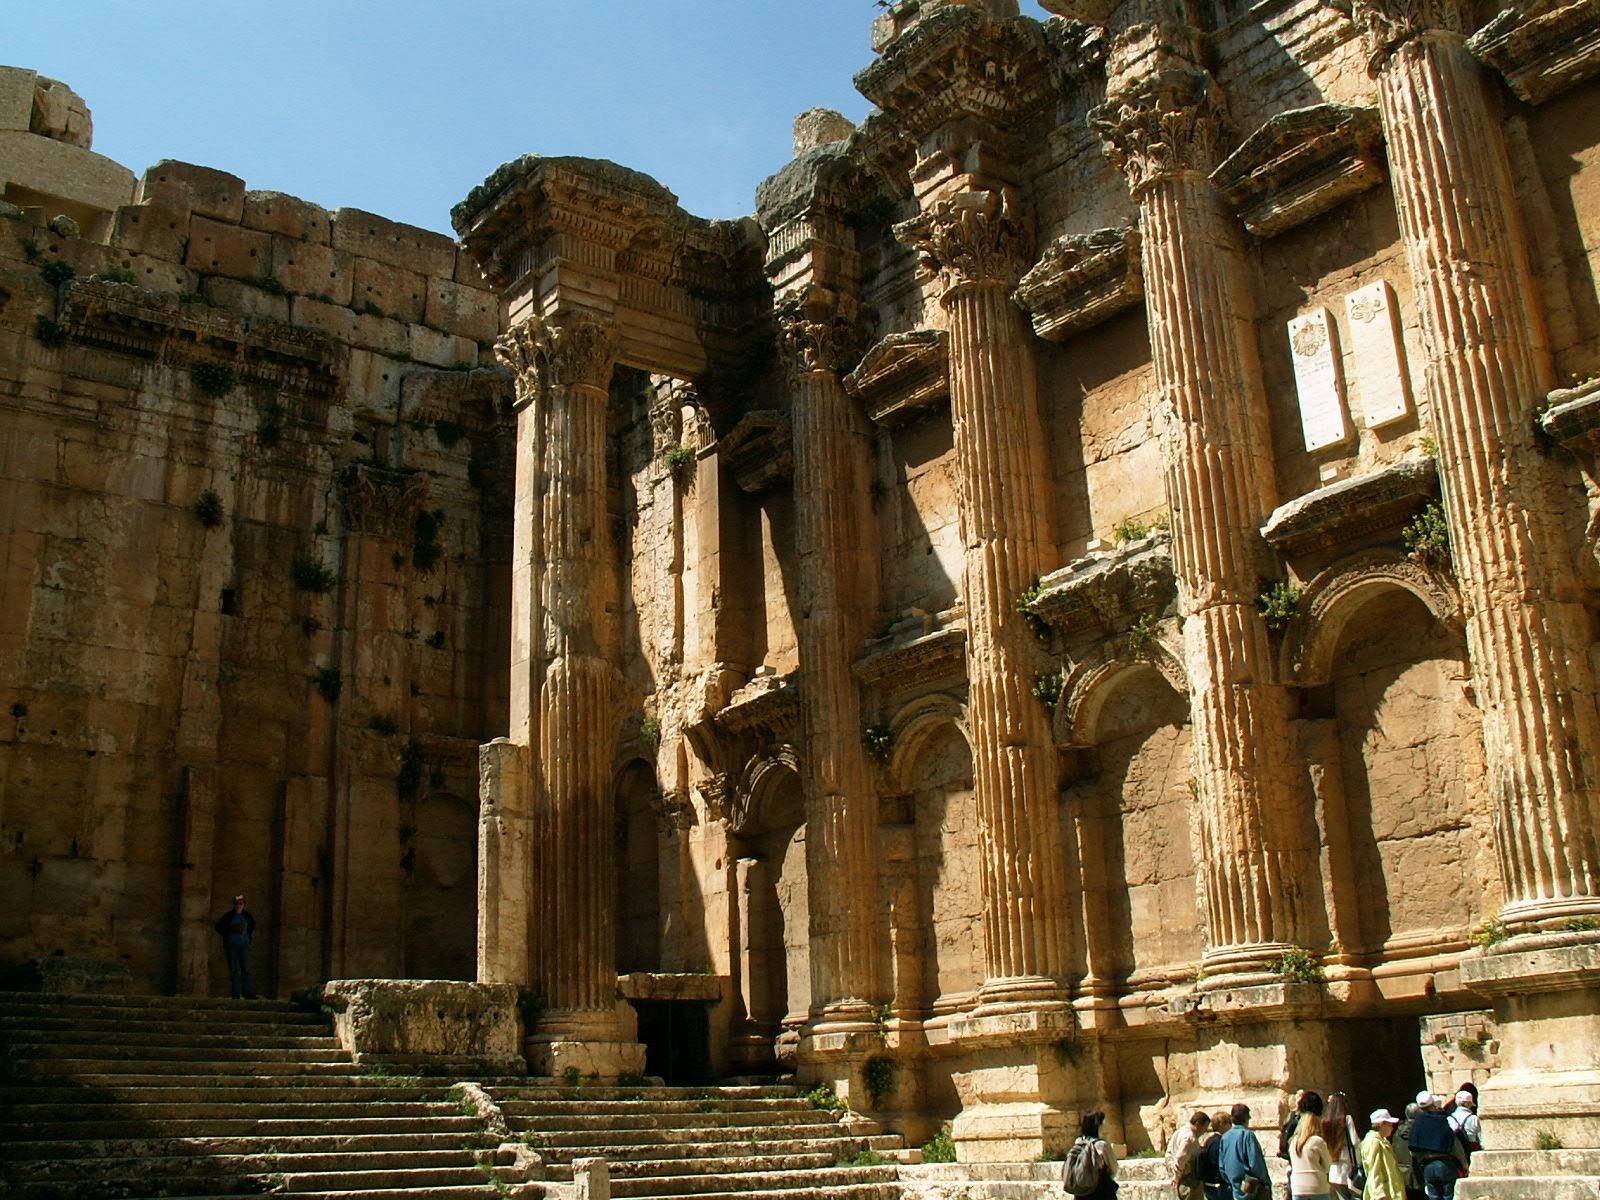 Baalbek Ancient City